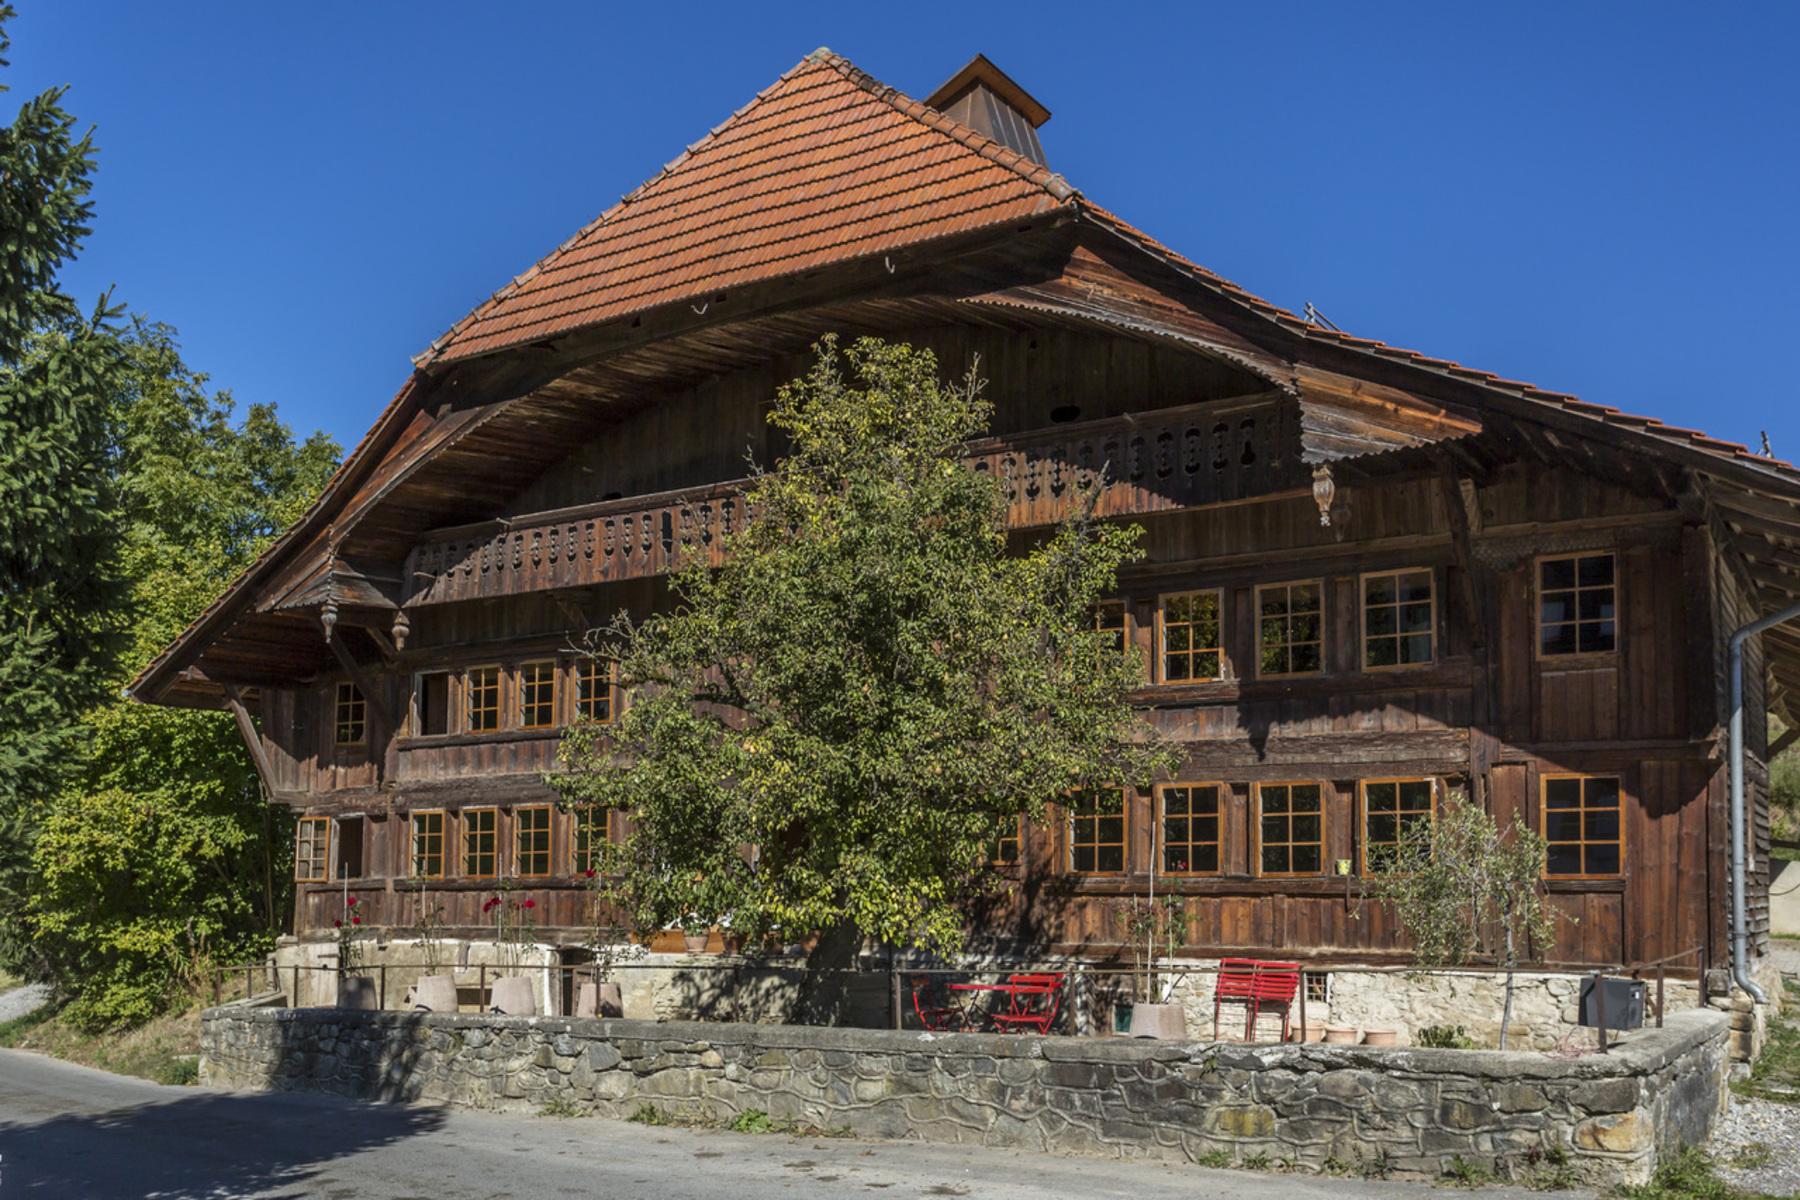 Ферма / ранчо / плантация для того Продажа на An authentic, historic farm with equestrian facilities Le Mouret Le Mouret, Фрибур, 1724 Швейцария